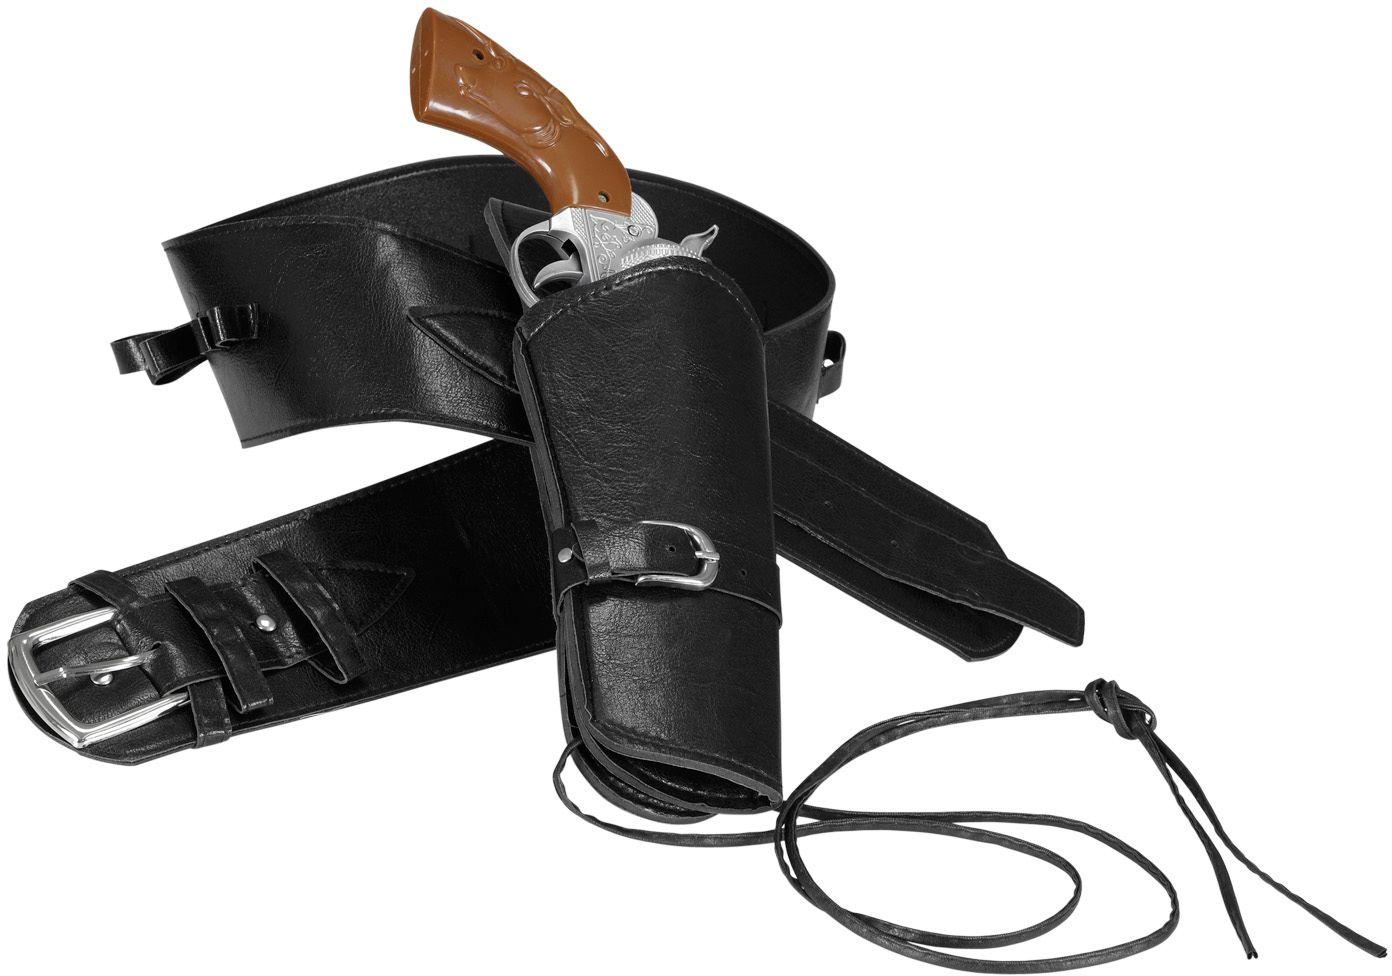 Zwarte lederlook riem met holsters